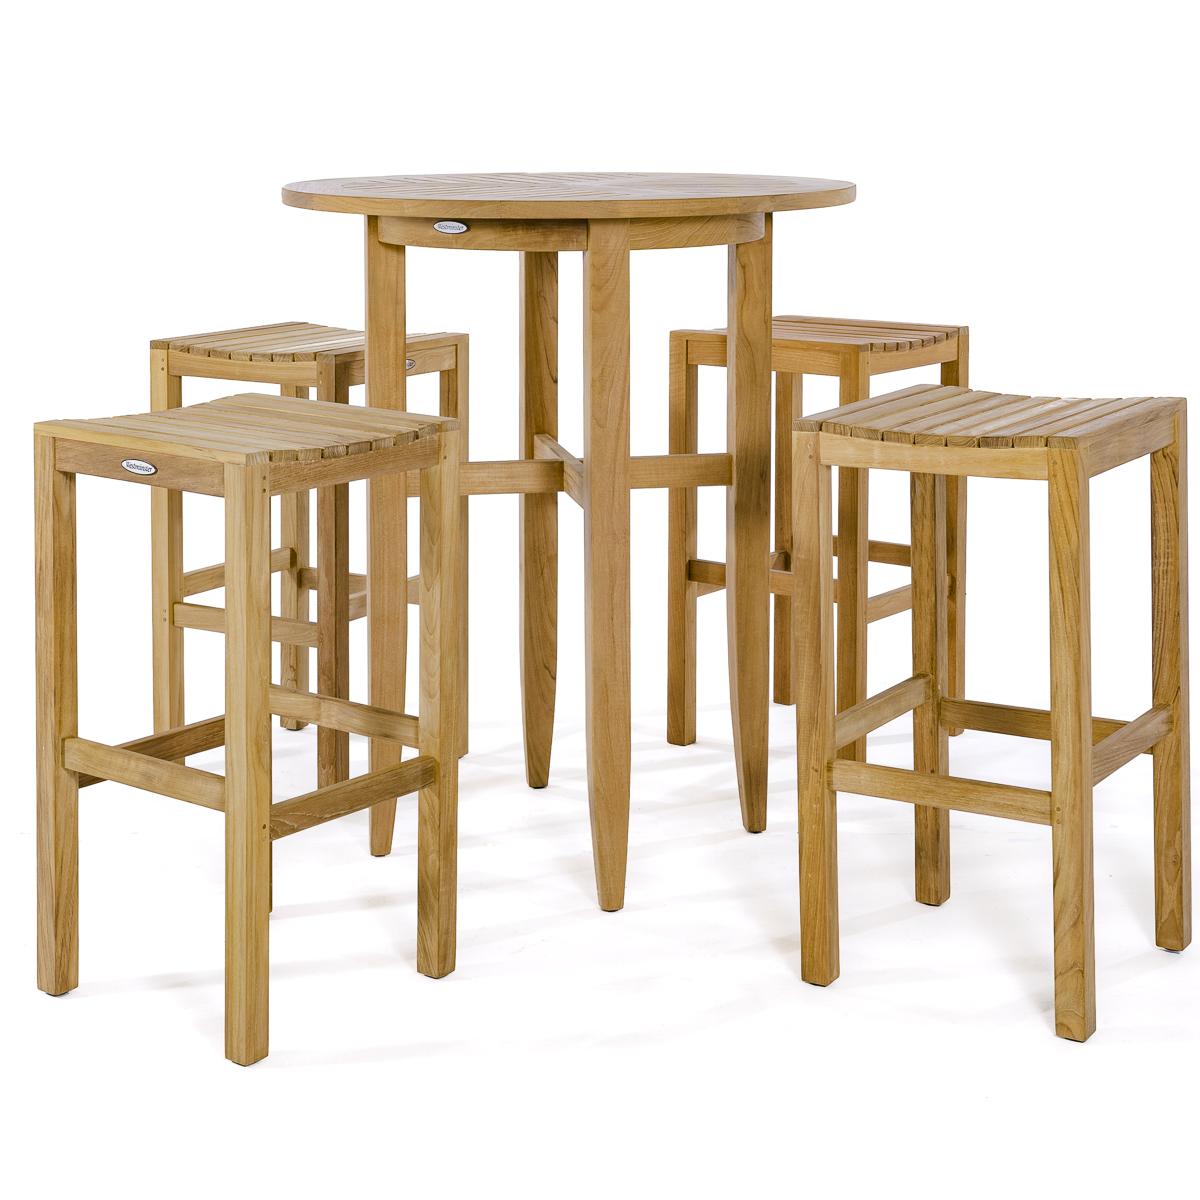 The 5 piece Somerset Laguna Bar Set ...  sc 1 st  Westminster Teak & Teak Backless Bar Stool and Table Set - Westminster Teak Outdoor ...